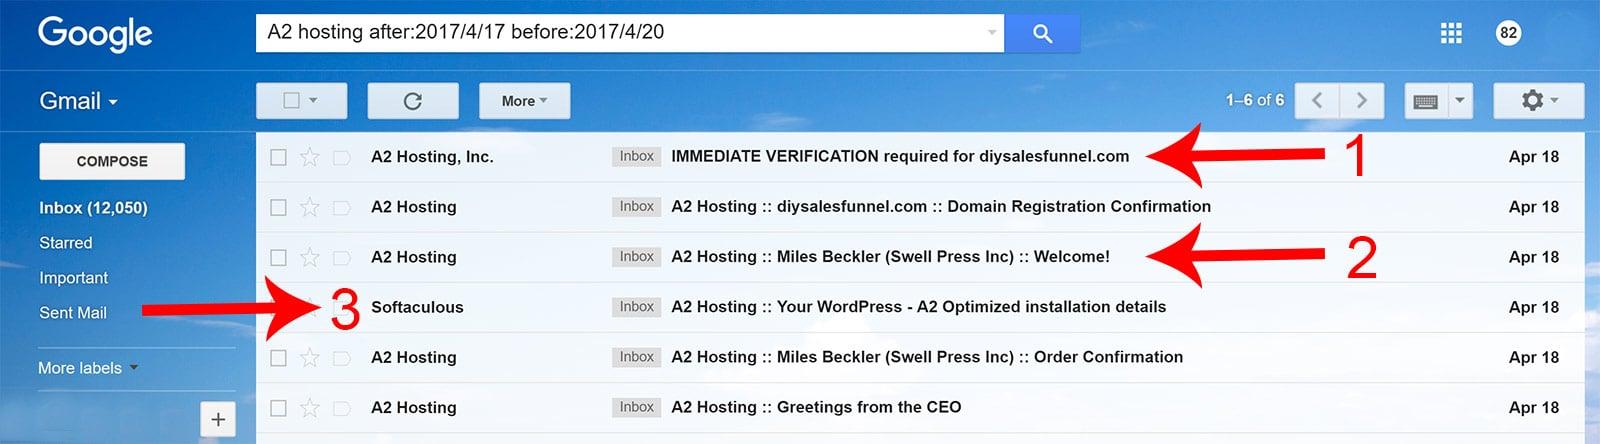 A2 Hosting Emails